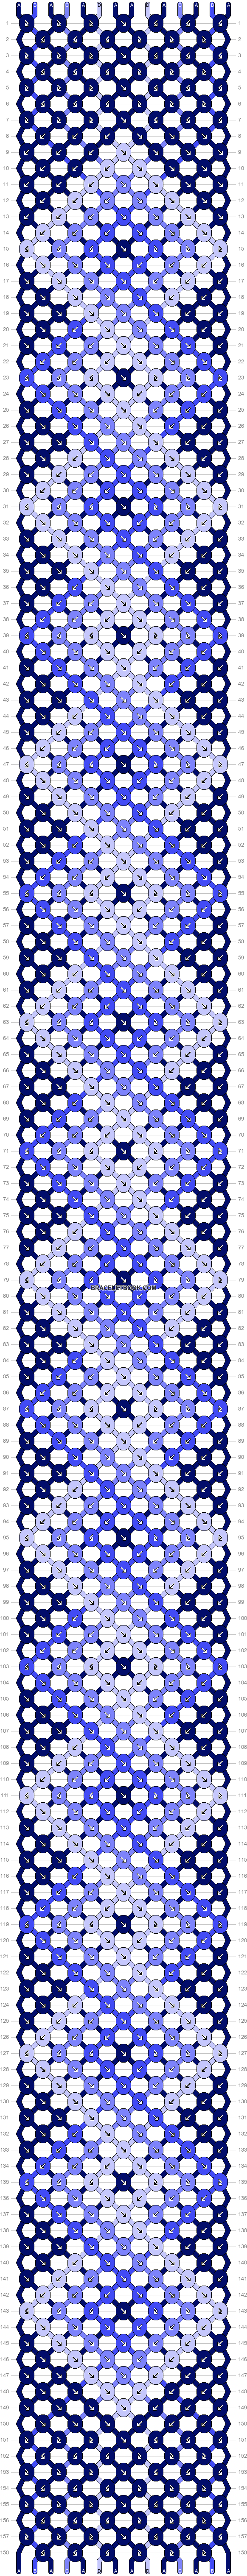 Normal pattern #16563 pattern